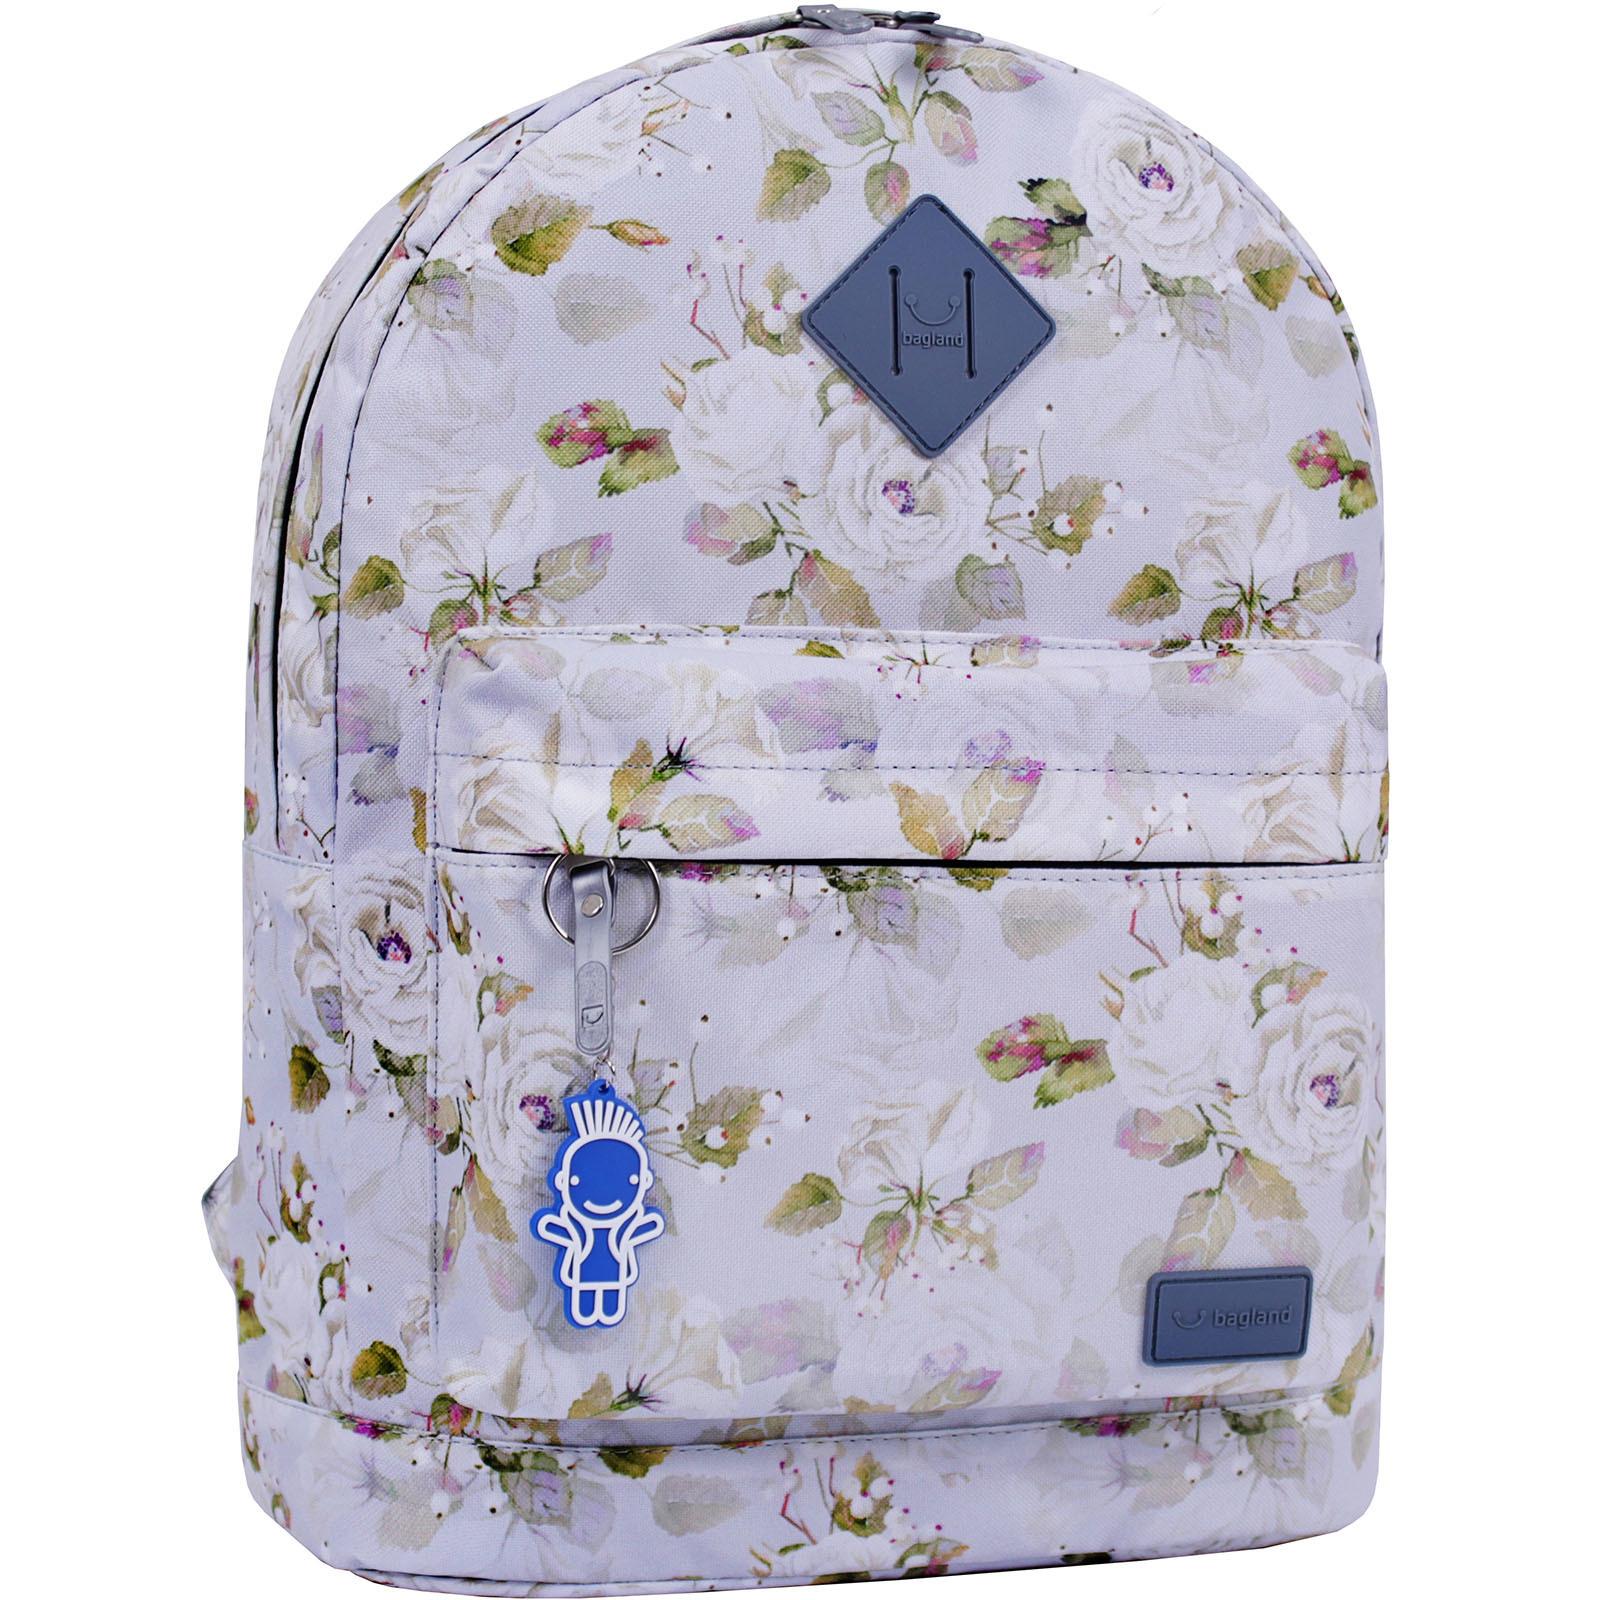 Городские рюкзаки Рюкзак Bagland Молодежный 17 л. сублимация 187 (00533664) IMG_0363_суб.187_.JPG